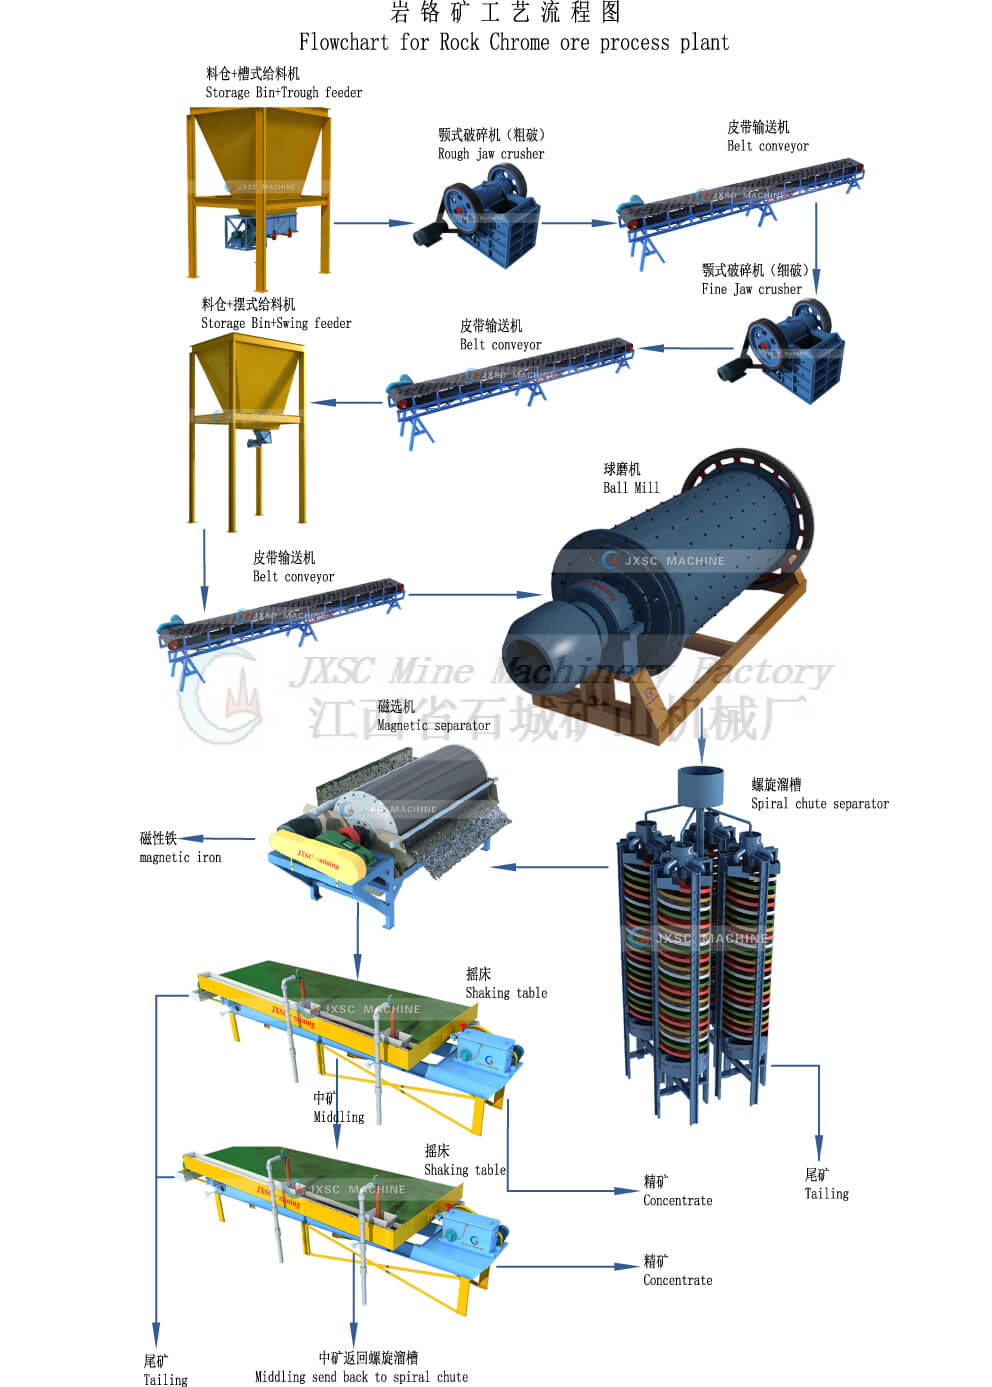 Rock Chrome Ore process plant